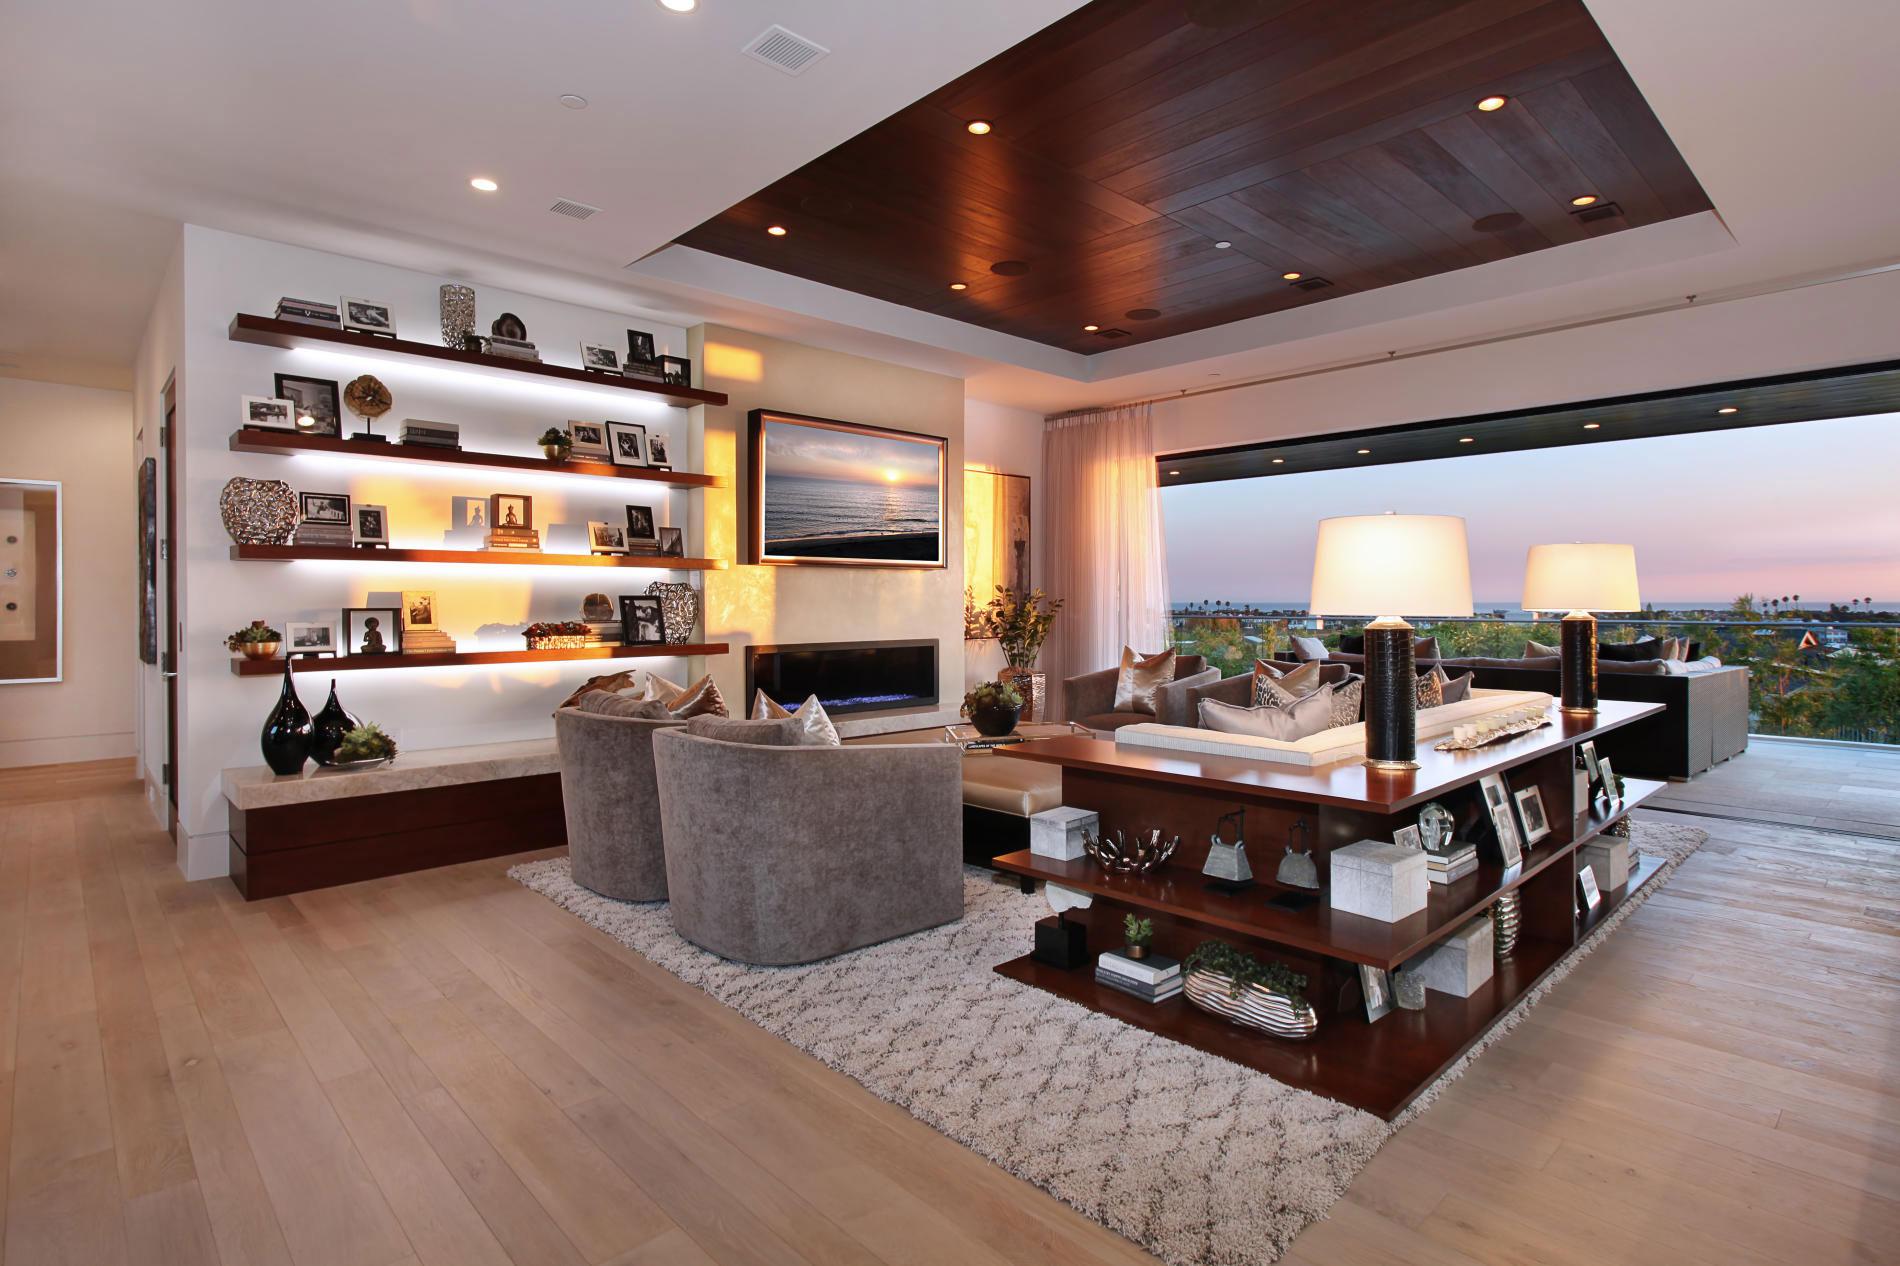 Living Room, Balcony, Views, Home in Corona del Mar, California